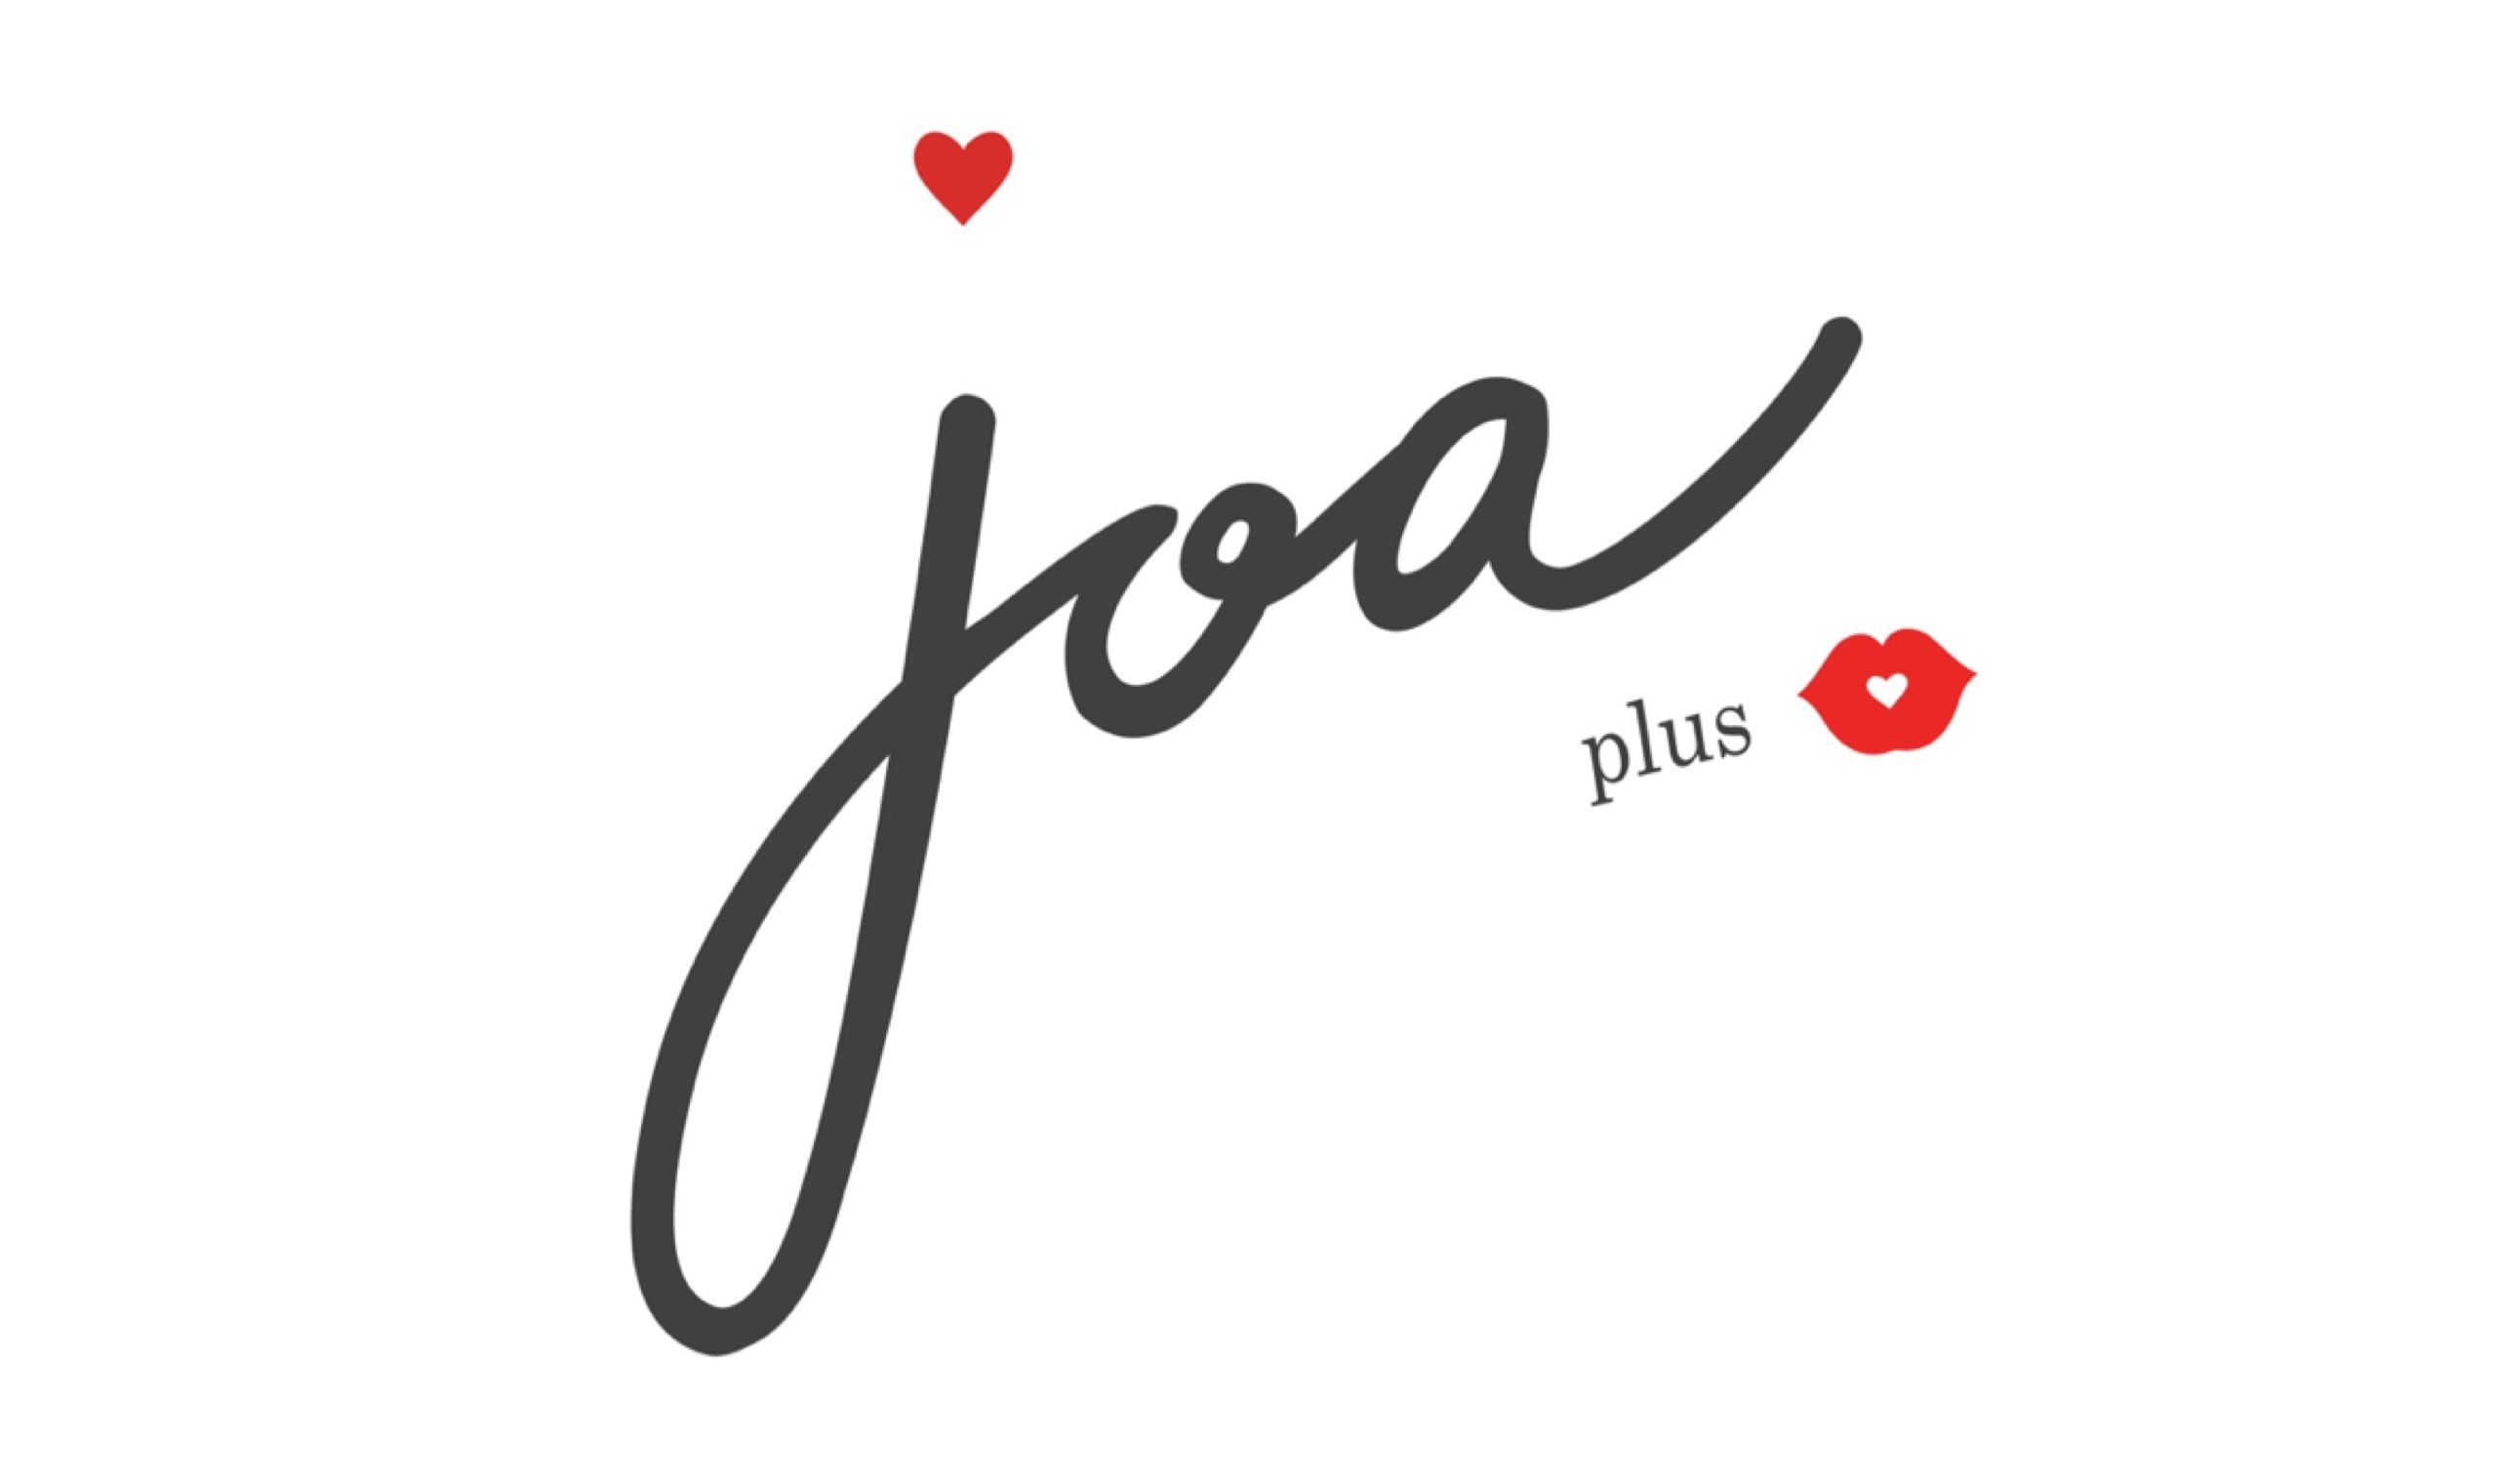 joaplus accessorie shop